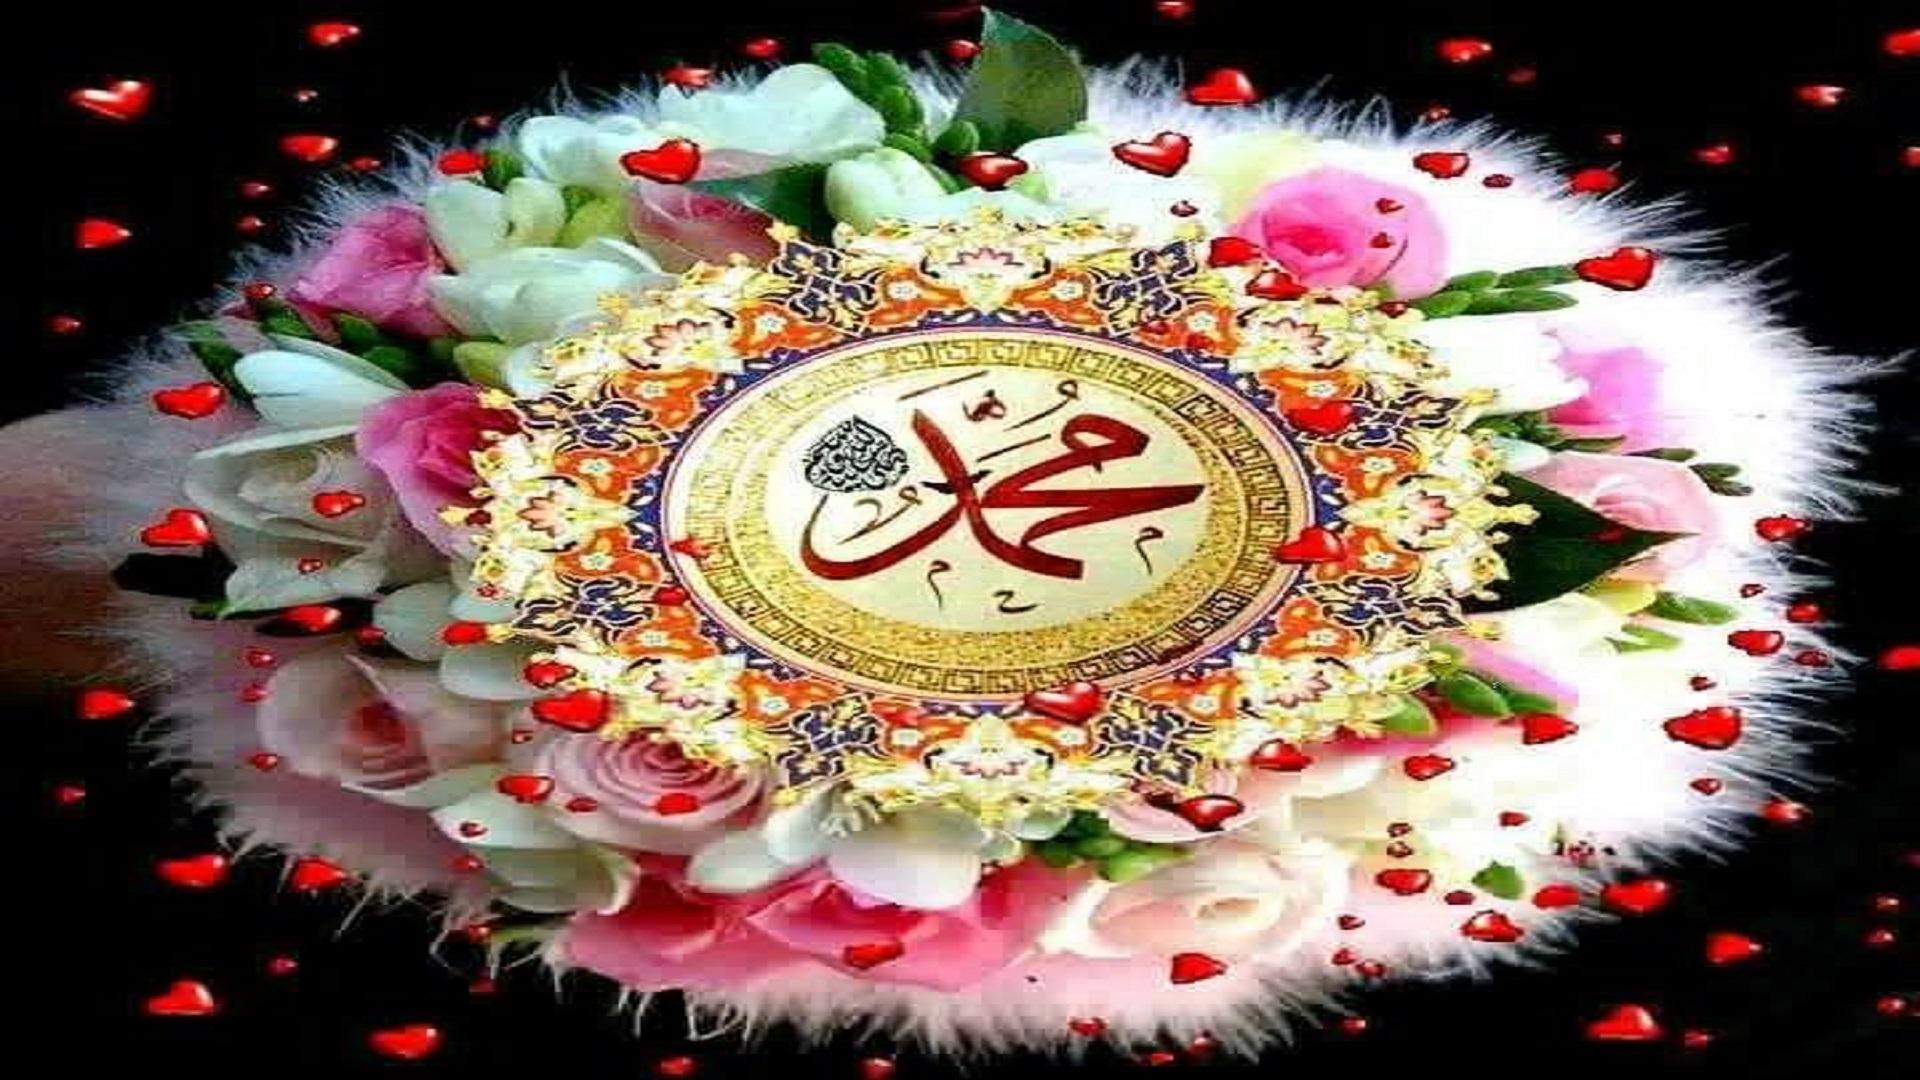 Beautiful Name Of Hazrat Muhammad Saw Free Hd Desktop Wallpapers